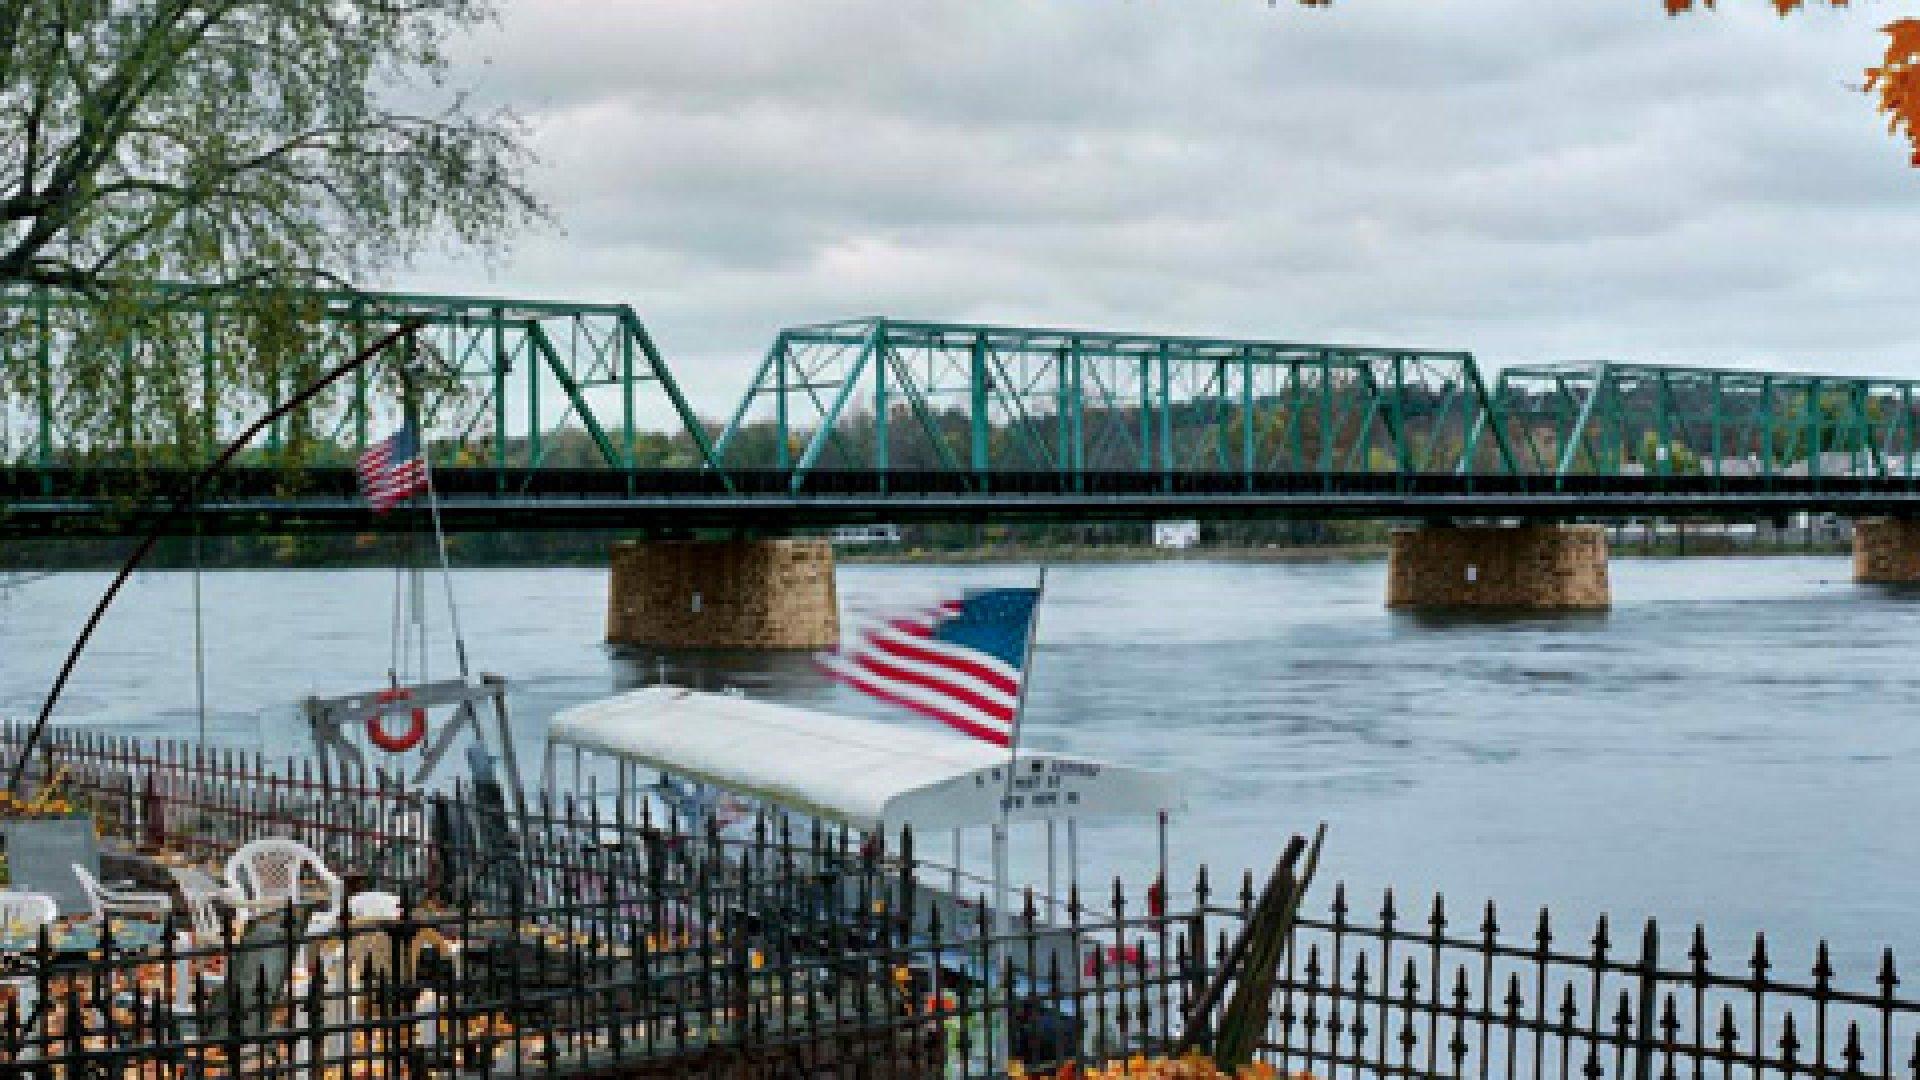 New Hope-Lambertville Bridge, Delaware River, New Hope, Pennsylvania